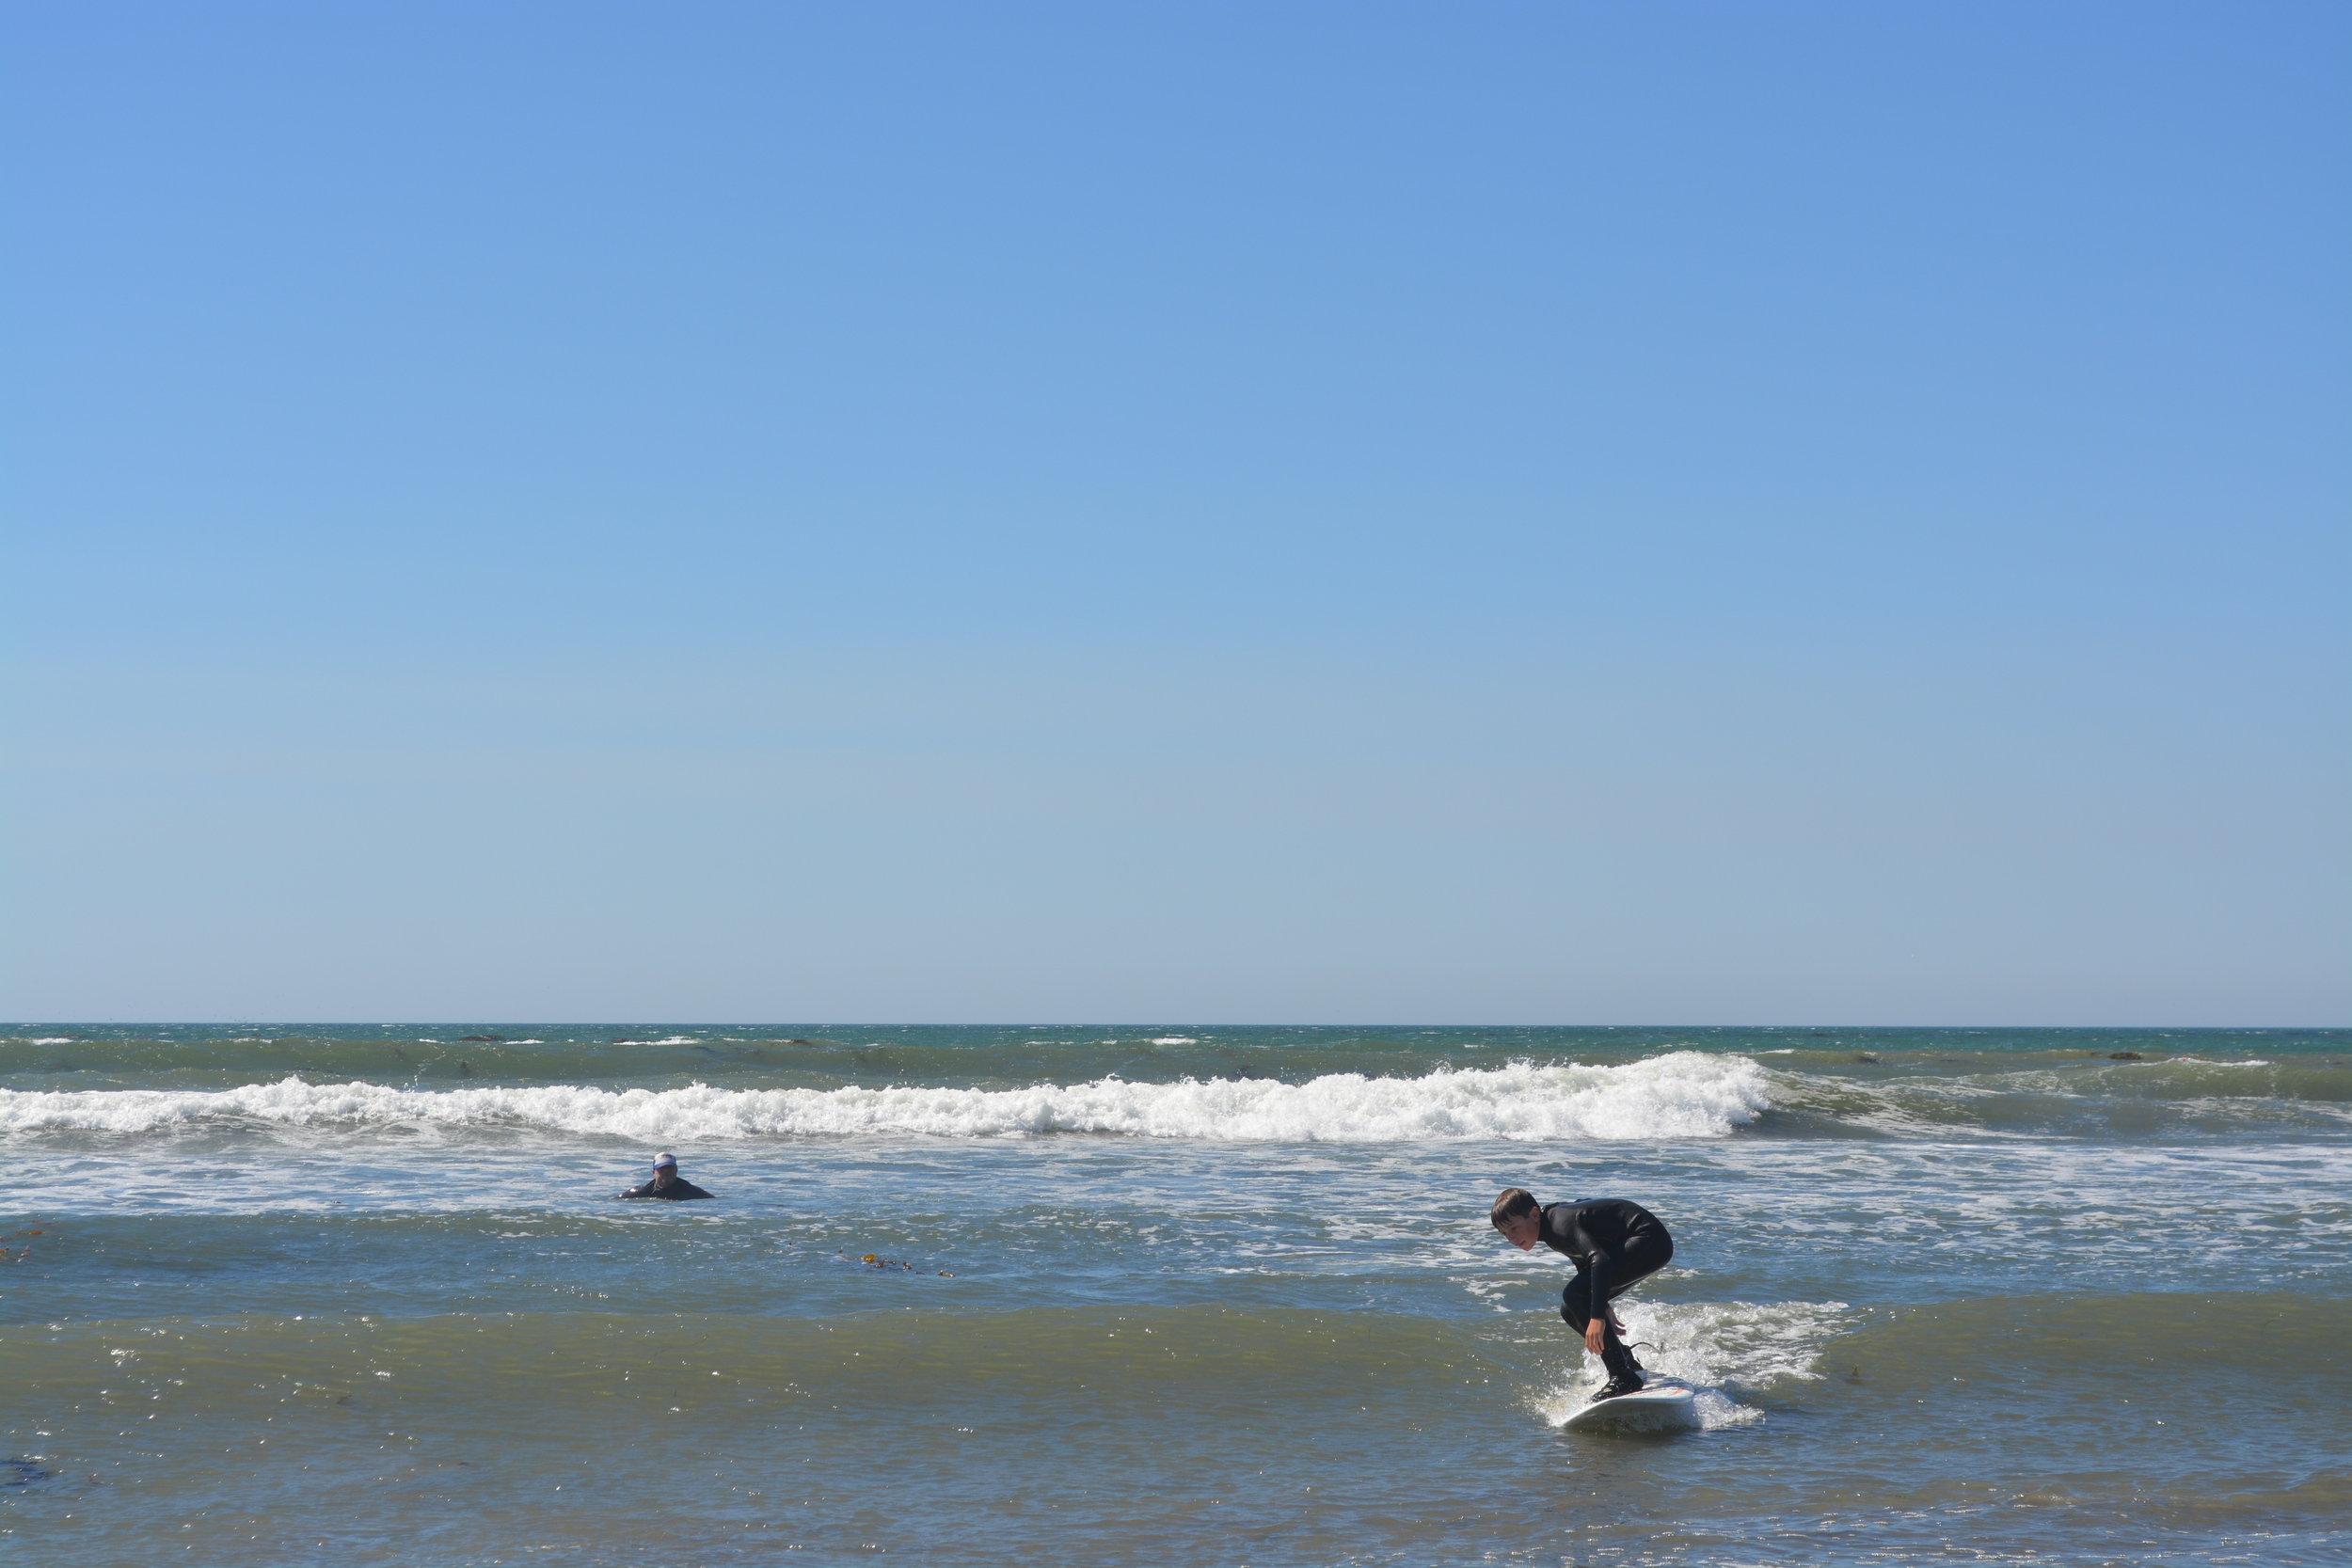 Baja California 10-5-13 Shipwrecks Surfing Adventure Ocean Experience Surf School San Diego (4).JPG